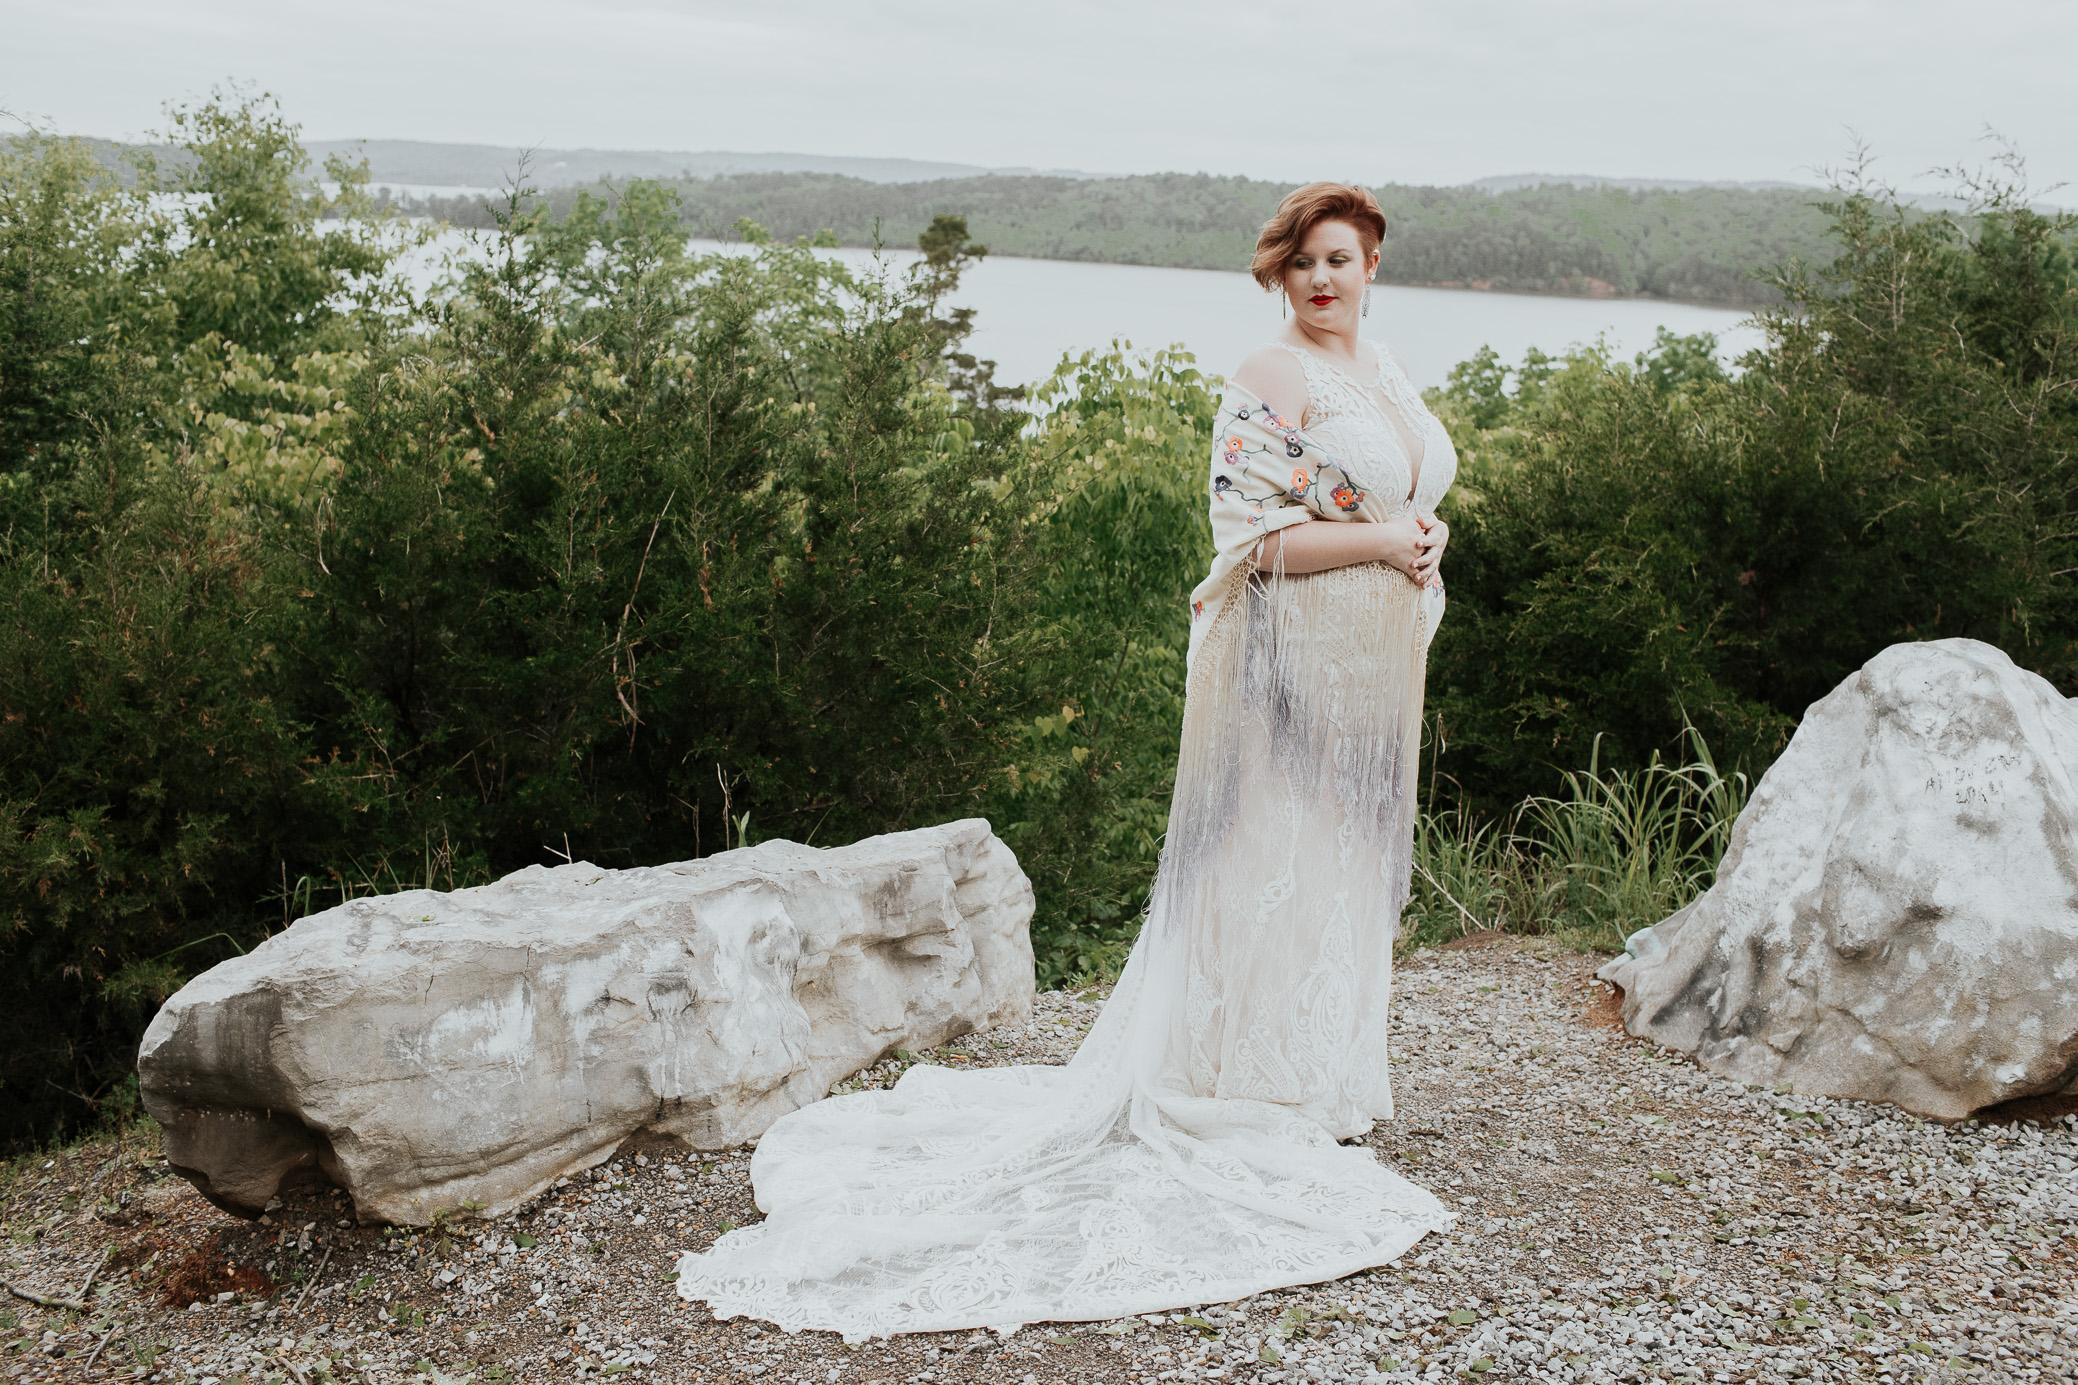 Alabama and Minnesota wedding photography at Lake Guntersville State Park by David A. Smith of DSmithImages Wedding Photography, Portraits, and Events, a wedding photographer in Birmingham, Alabama and Minneapolis, Minnesota.